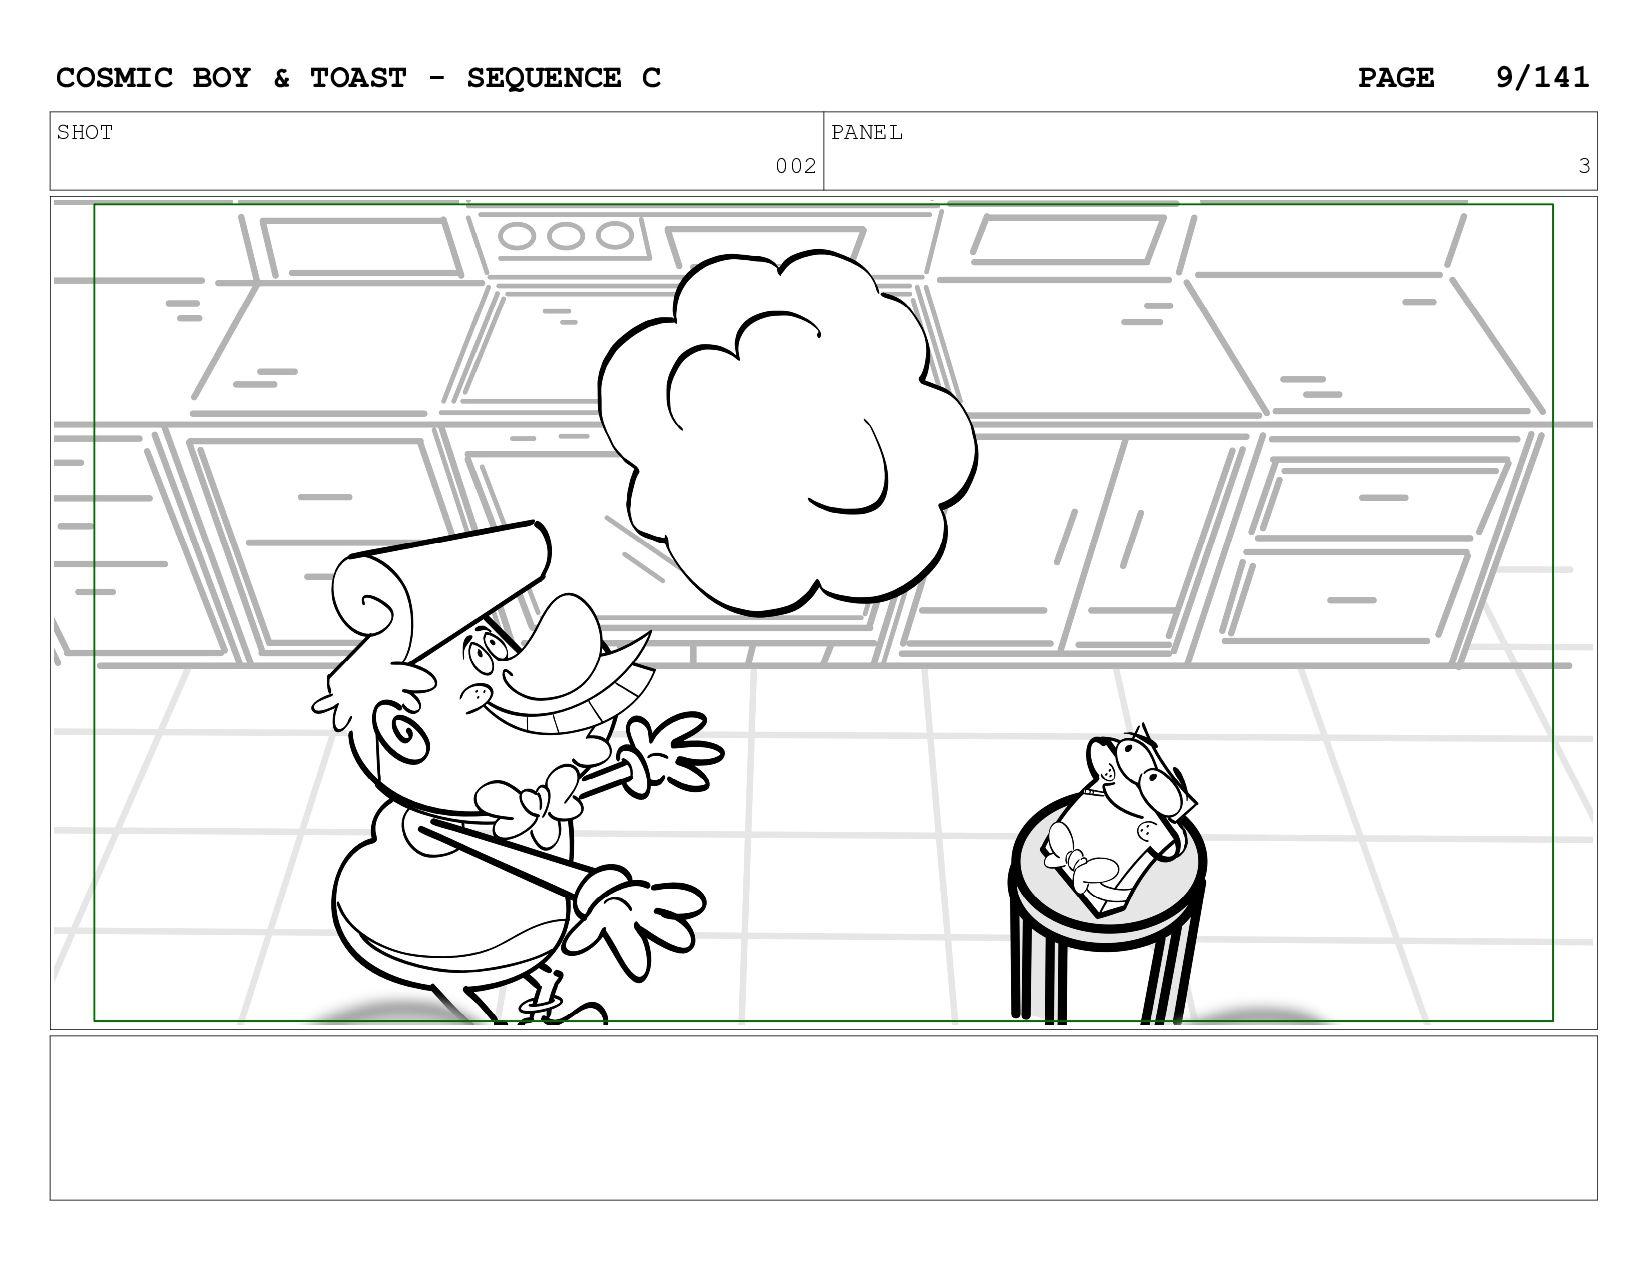 SCENE 002 PANEL C COSMIC BOY & TOAST - SEQUENCE...